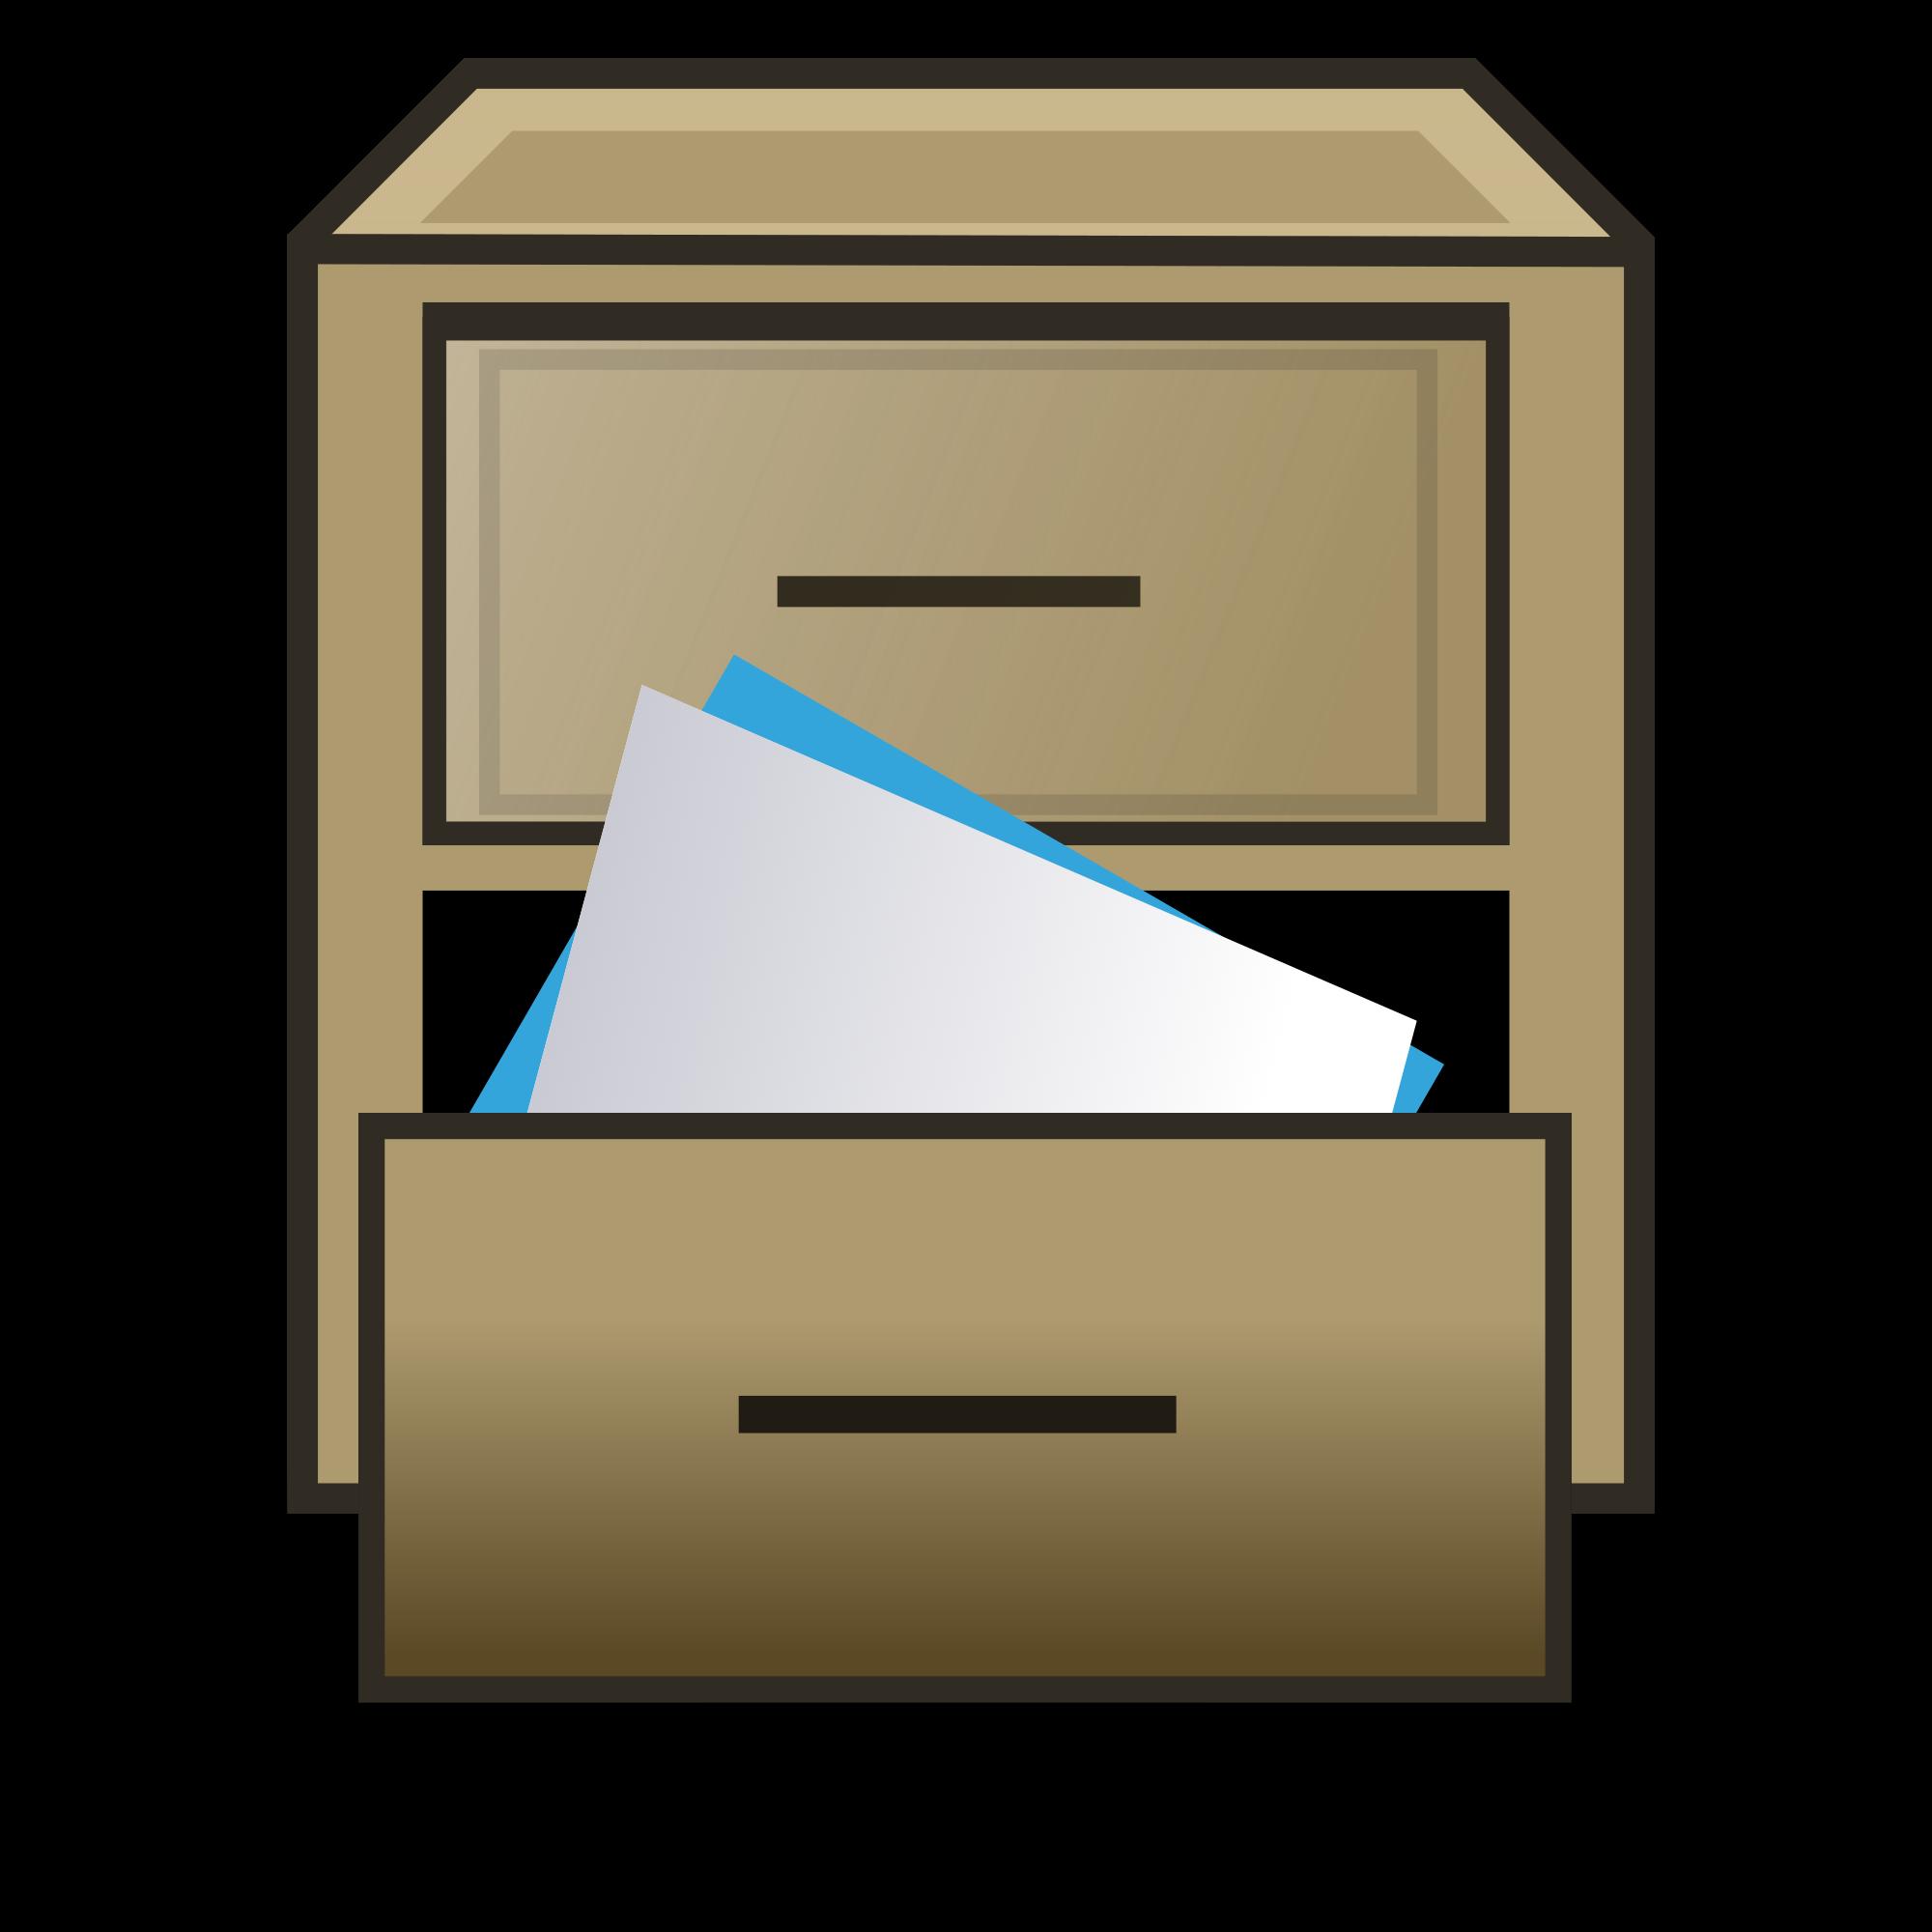 File cabinets clip art. Furniture clipart cupboard